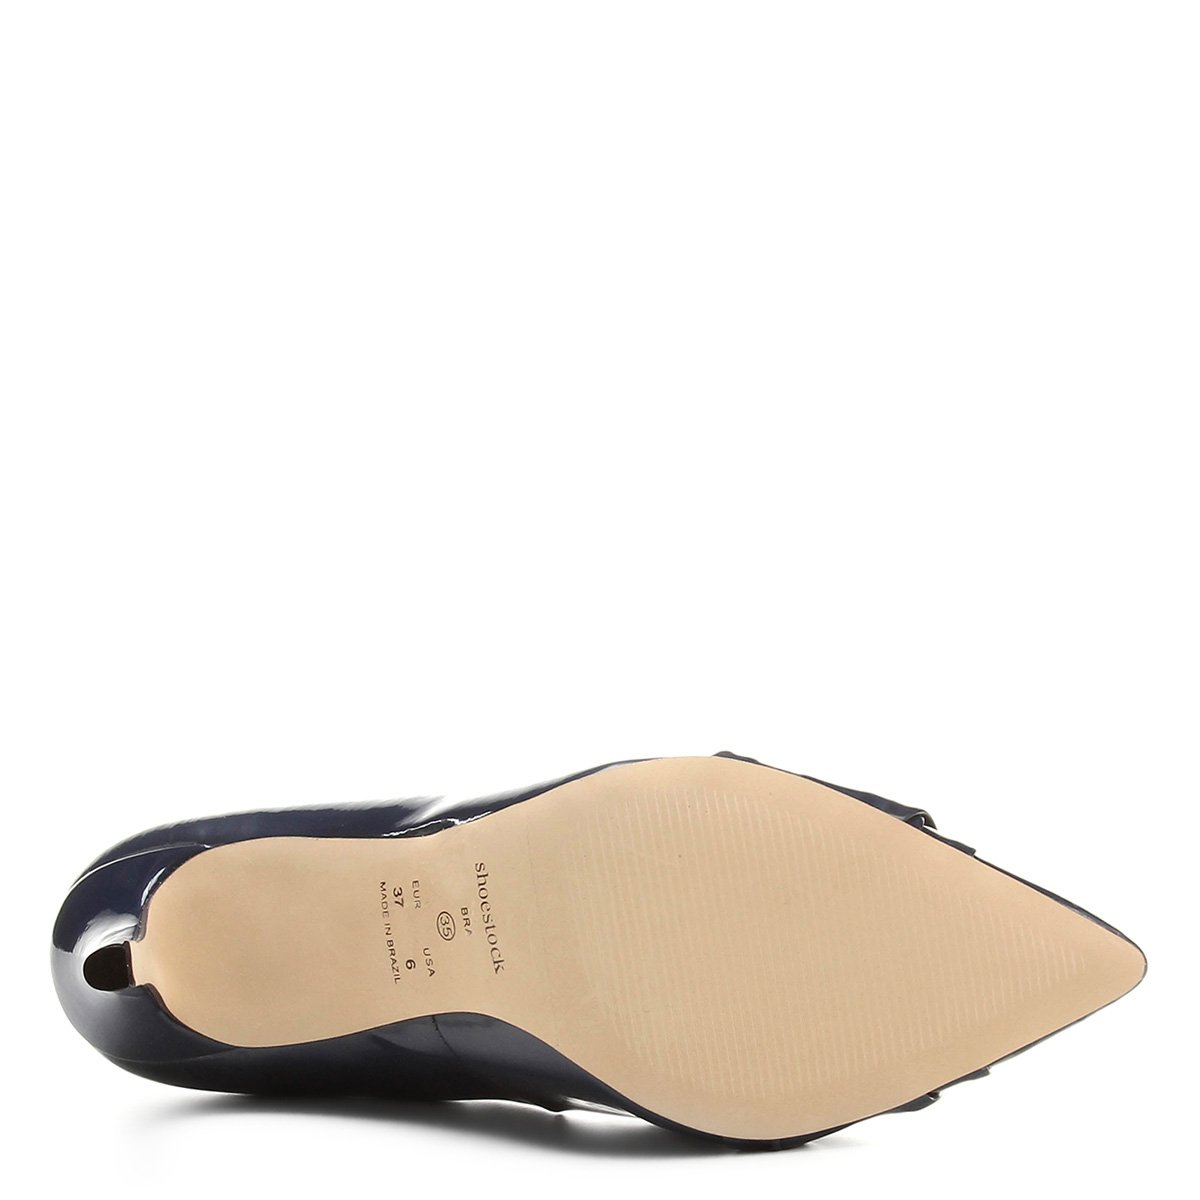 Scarpin Shoestock Alto Scarpin Marinho Shoestock Marinho Shoestock Salto Salto Alto Scarpin qIBwHnPBY